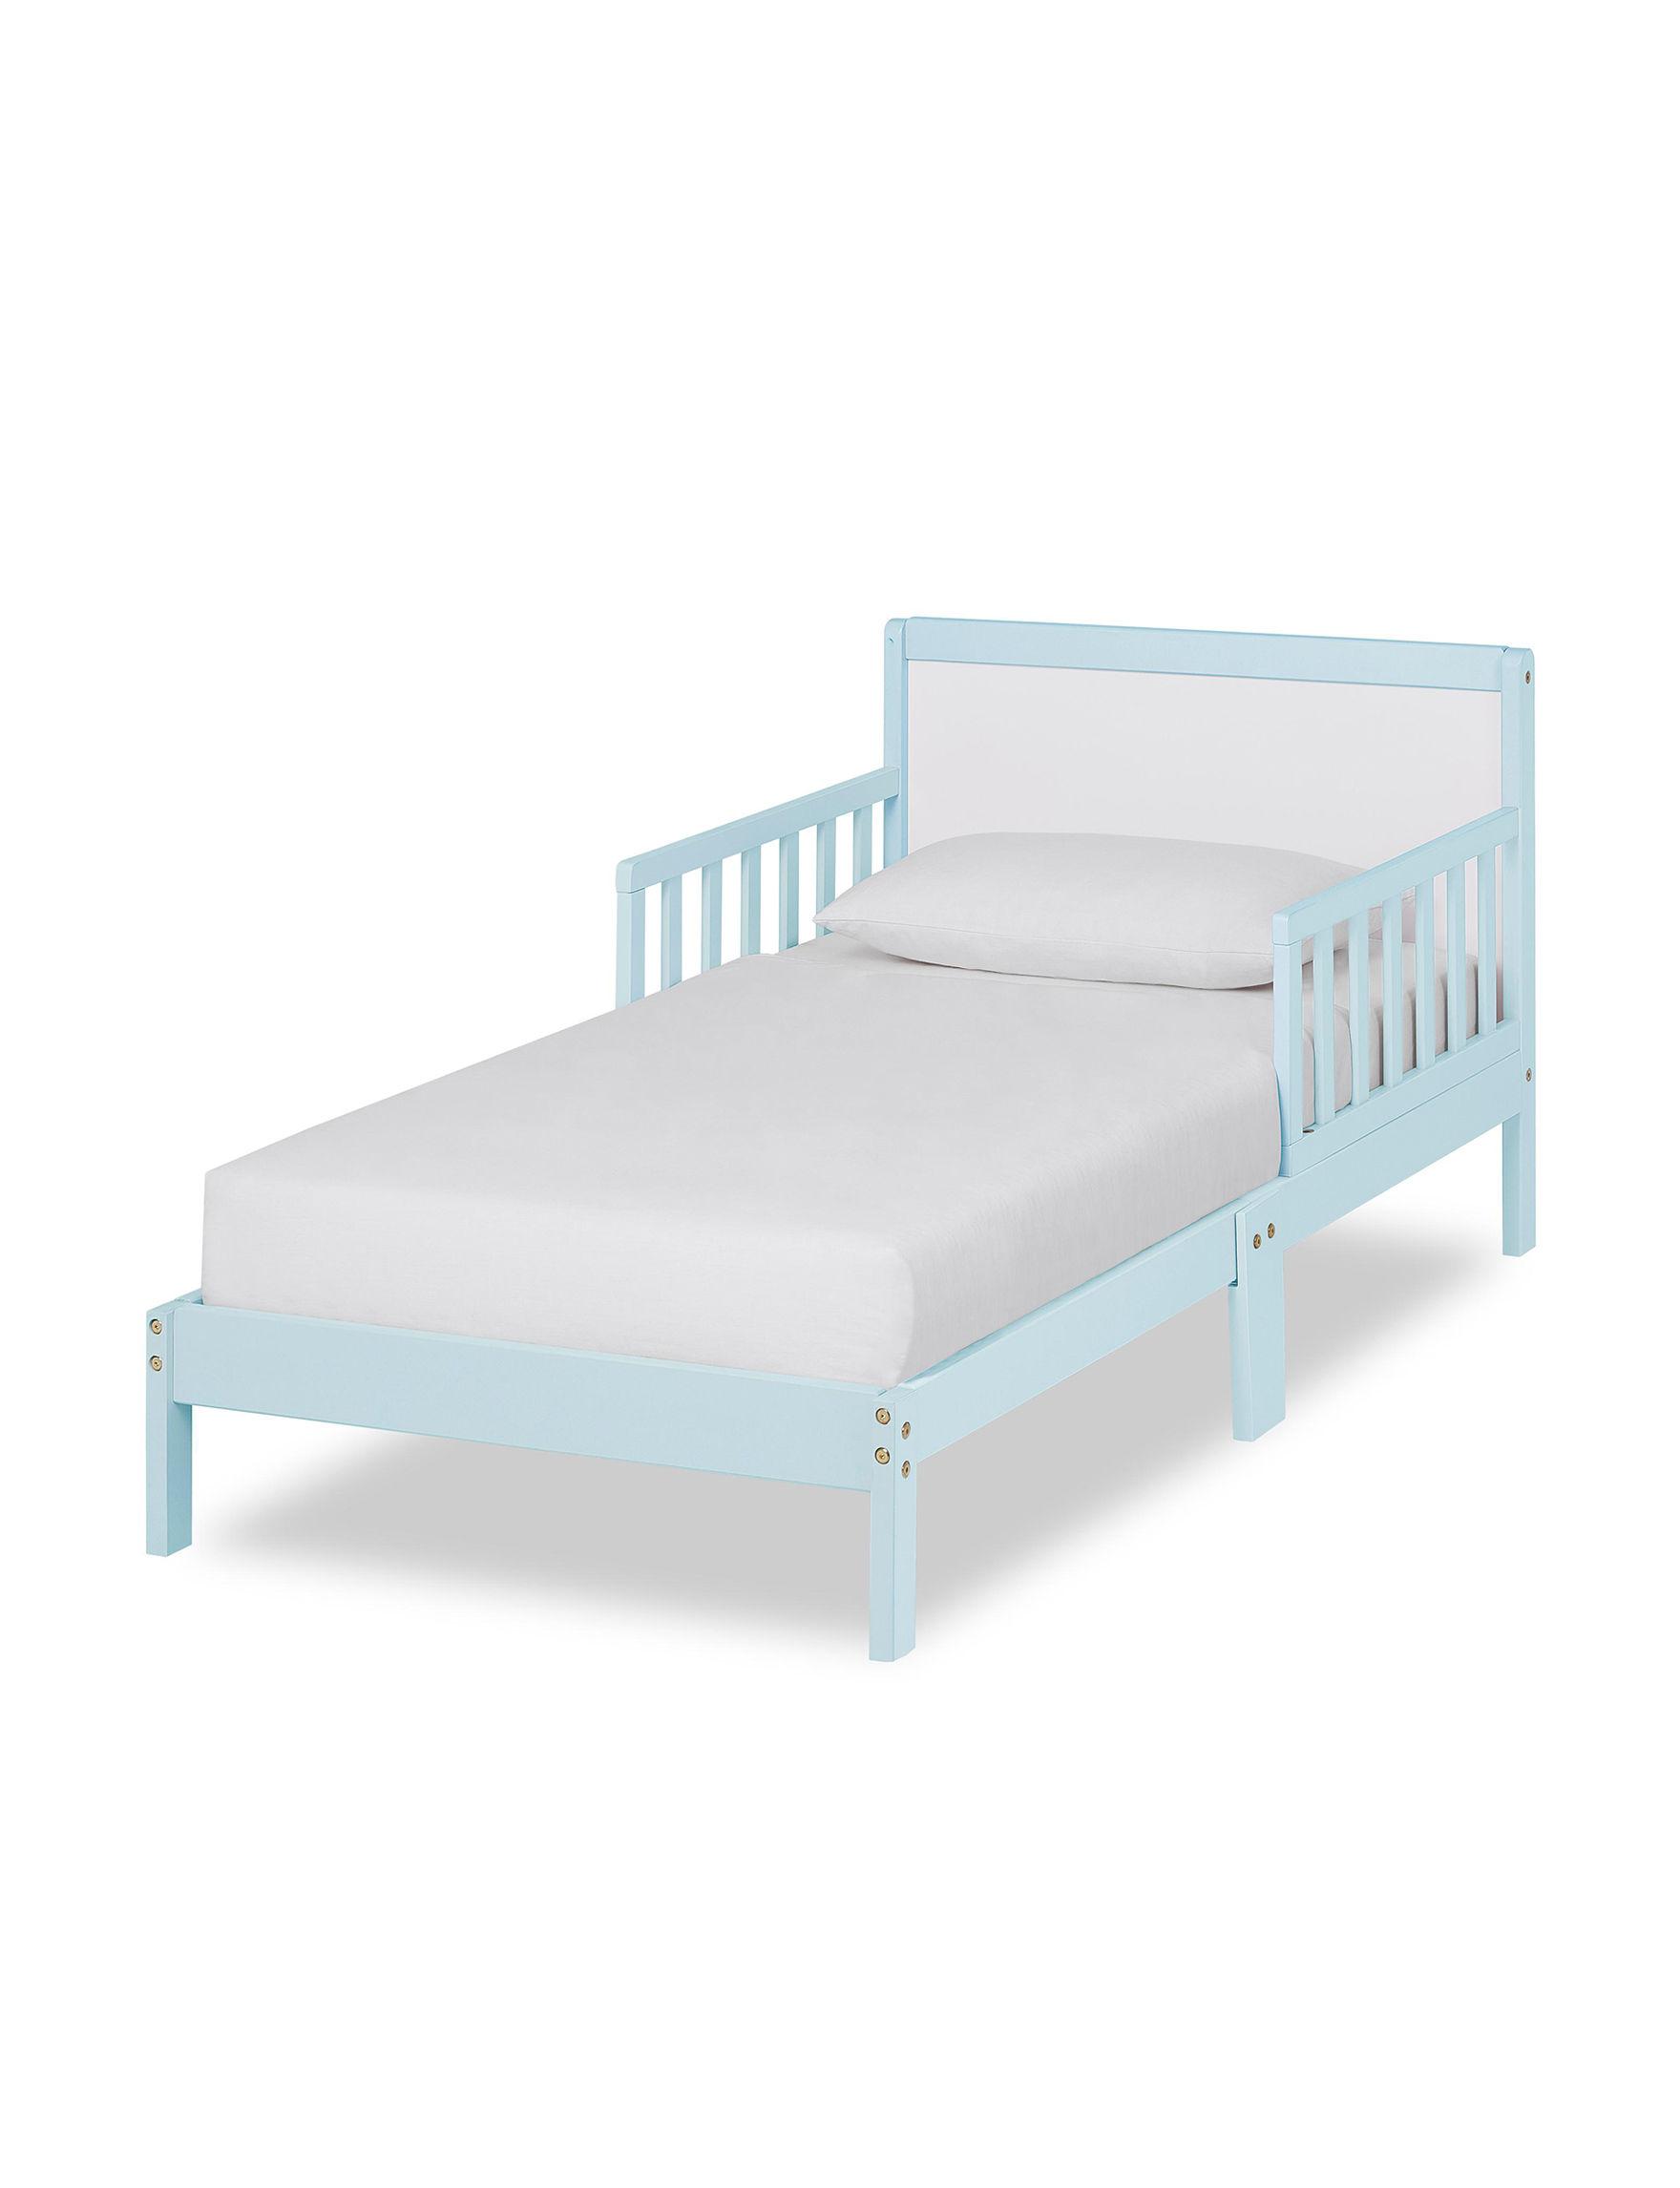 Dream On Me Sky Blue / White Beds & Headboards Bedroom Furniture